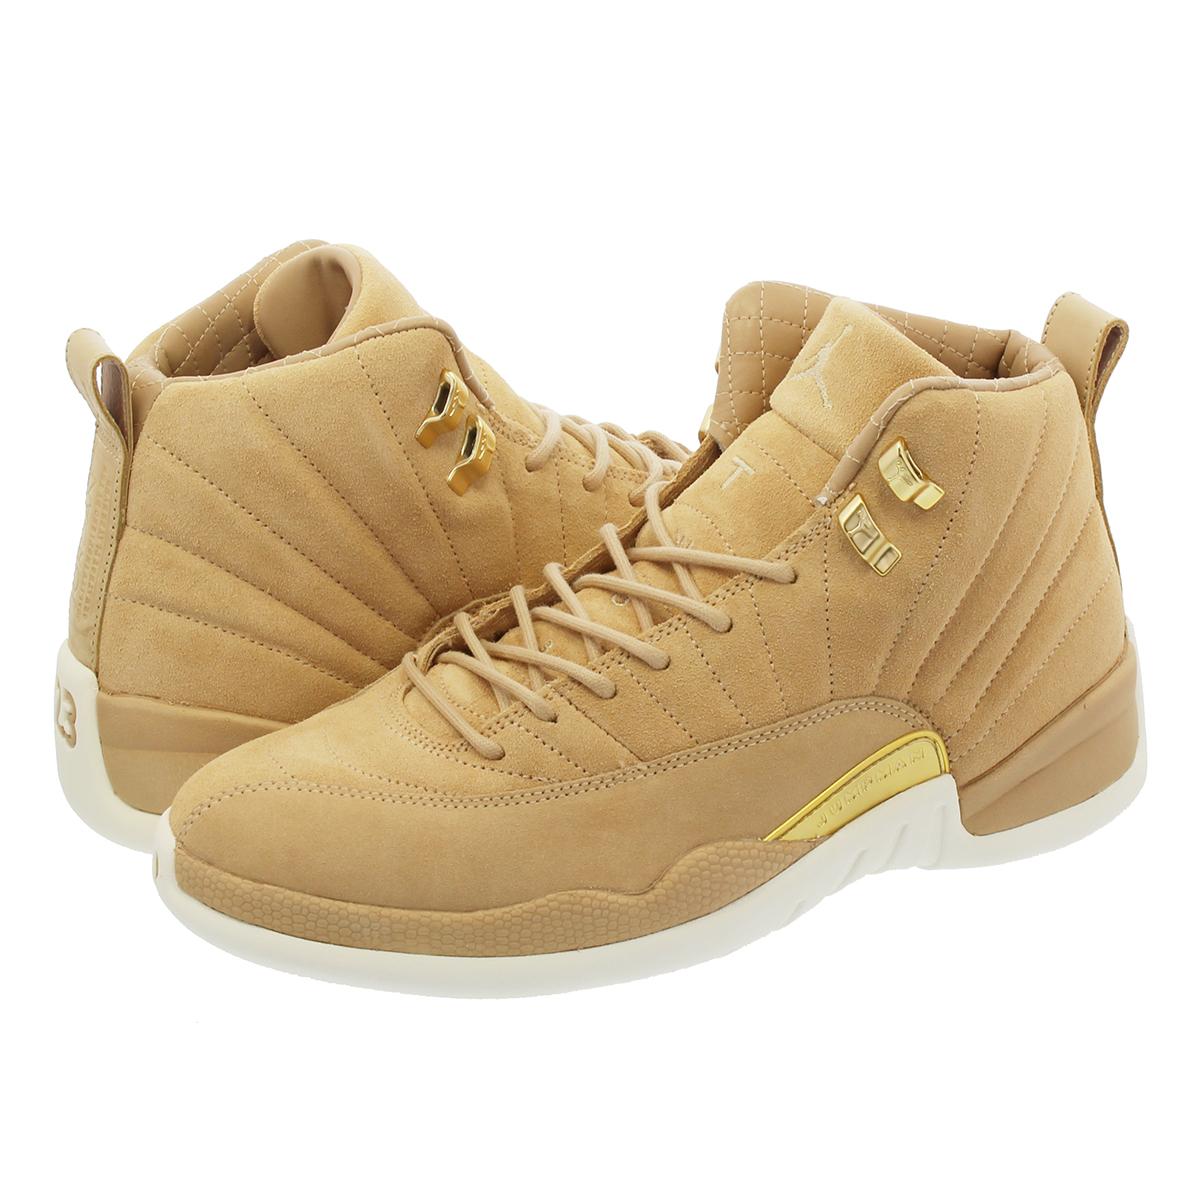 4ea918d83c5 SELECT SHOP LOWTEX: NIKE WMNS AIR JORDAN 12 RETRO Nike women Air Jordan 12  nostalgic VACHETTA TAN/MTLC GOLD/SAIL | Rakuten Global Market